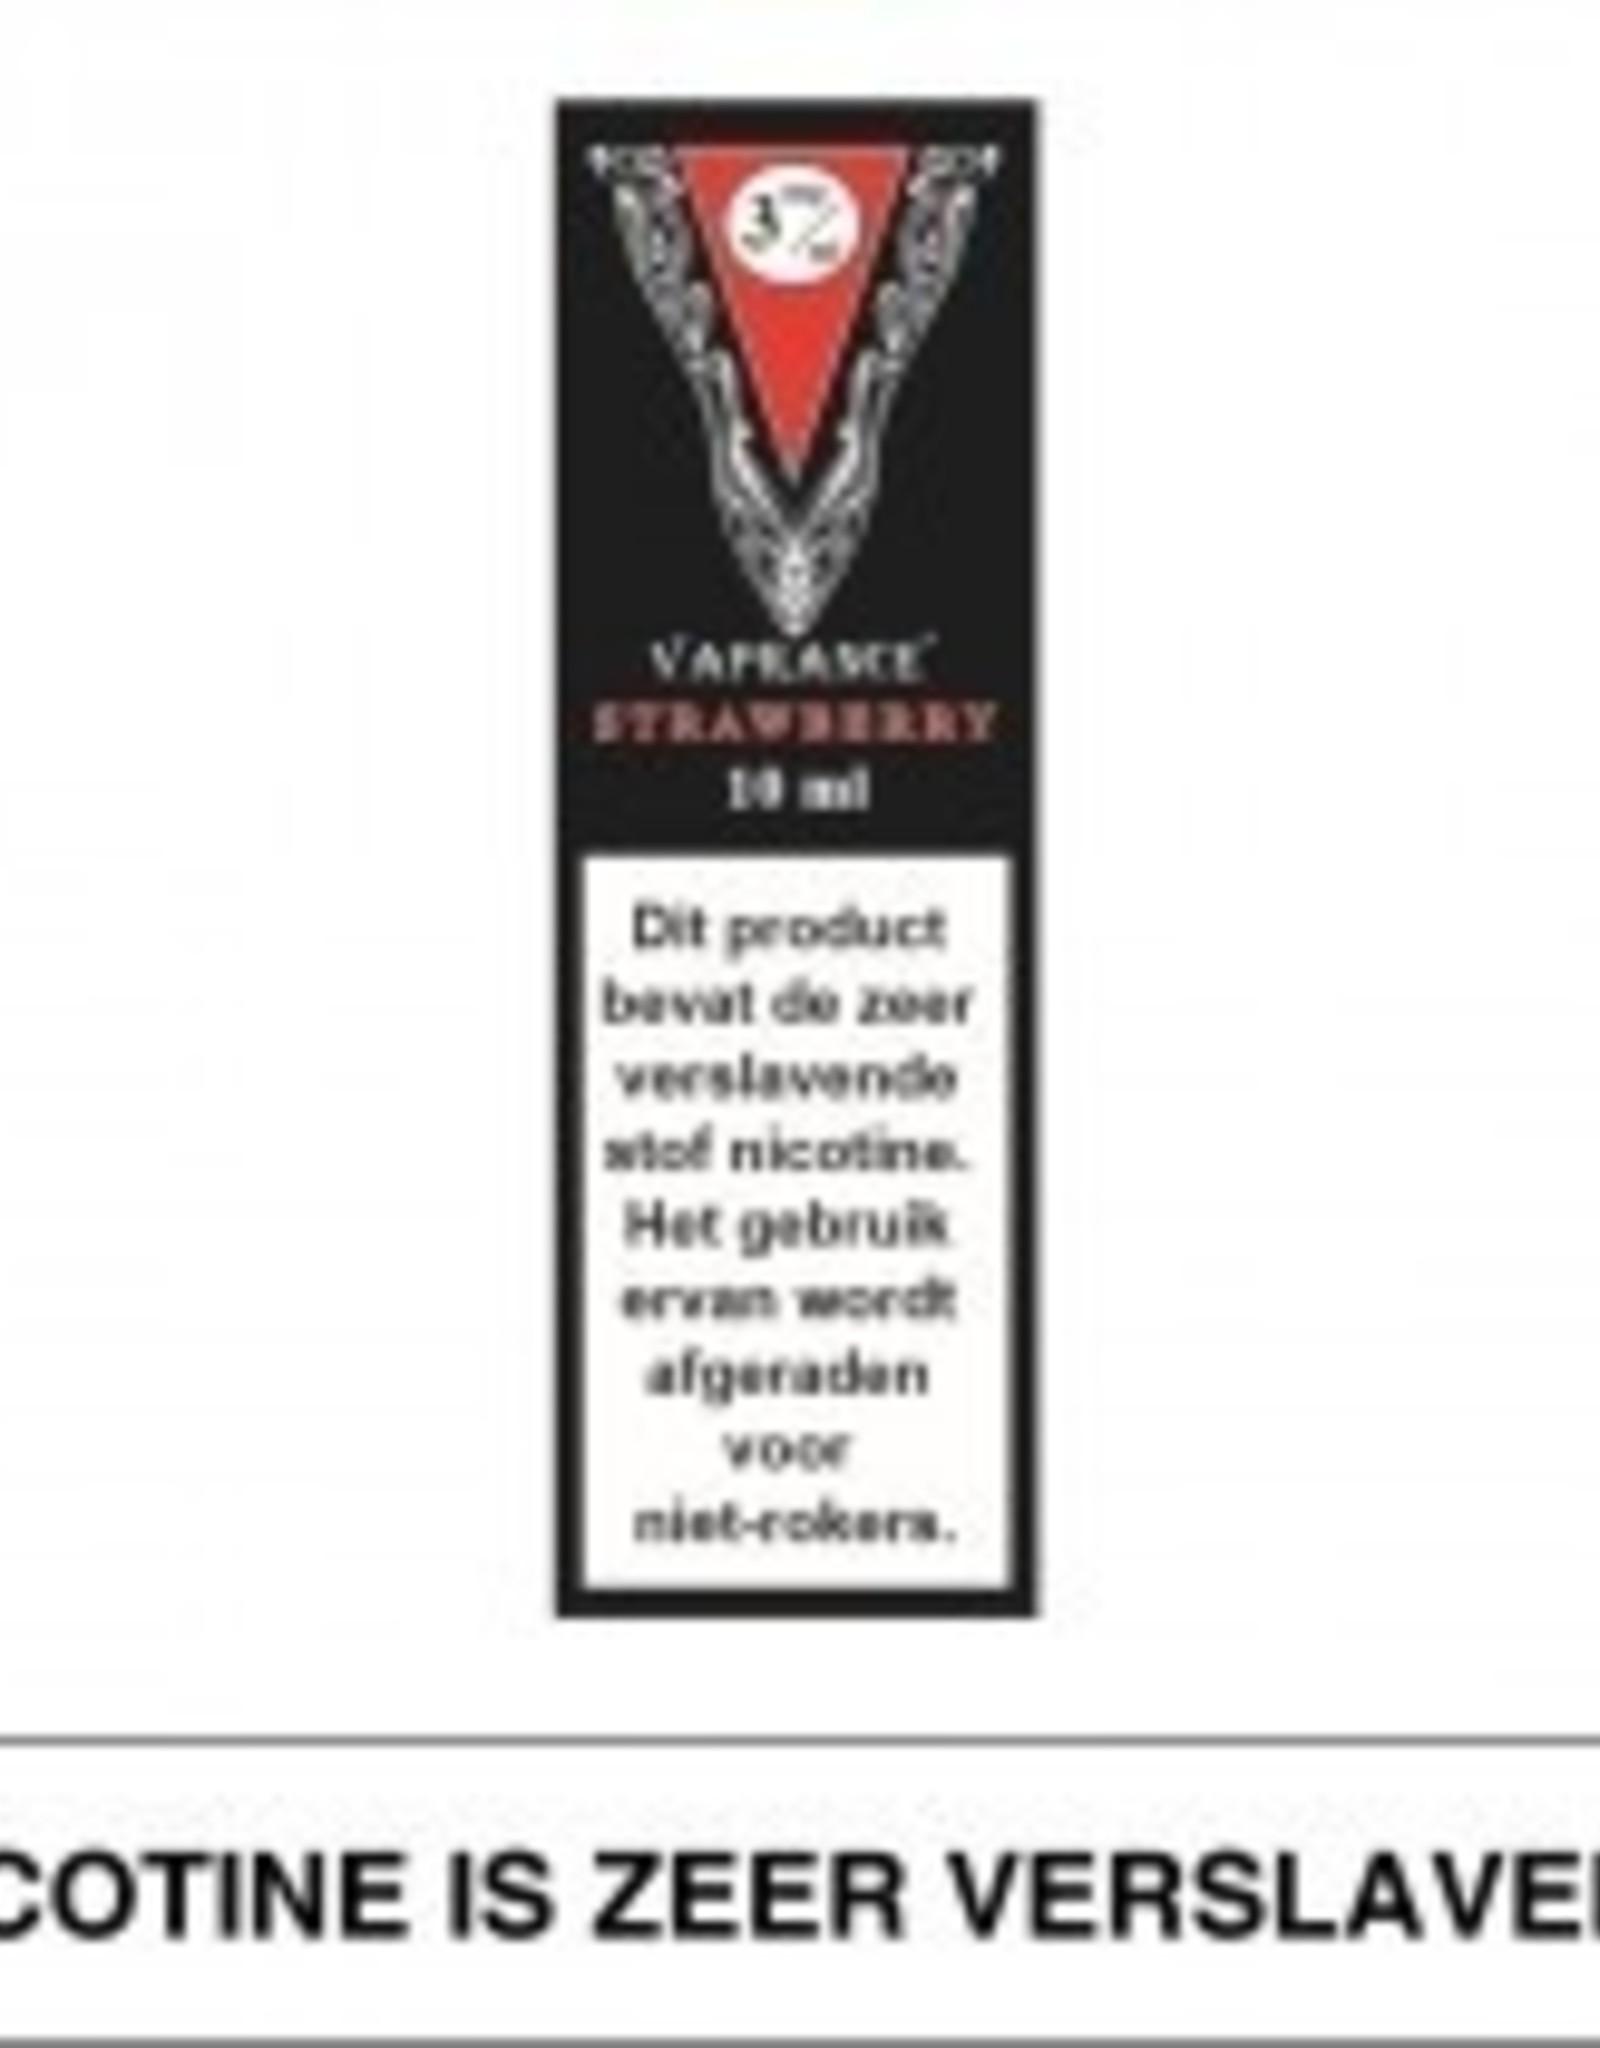 Vaprance Vaprance Black Label Strawberry 3 mg Nicotine